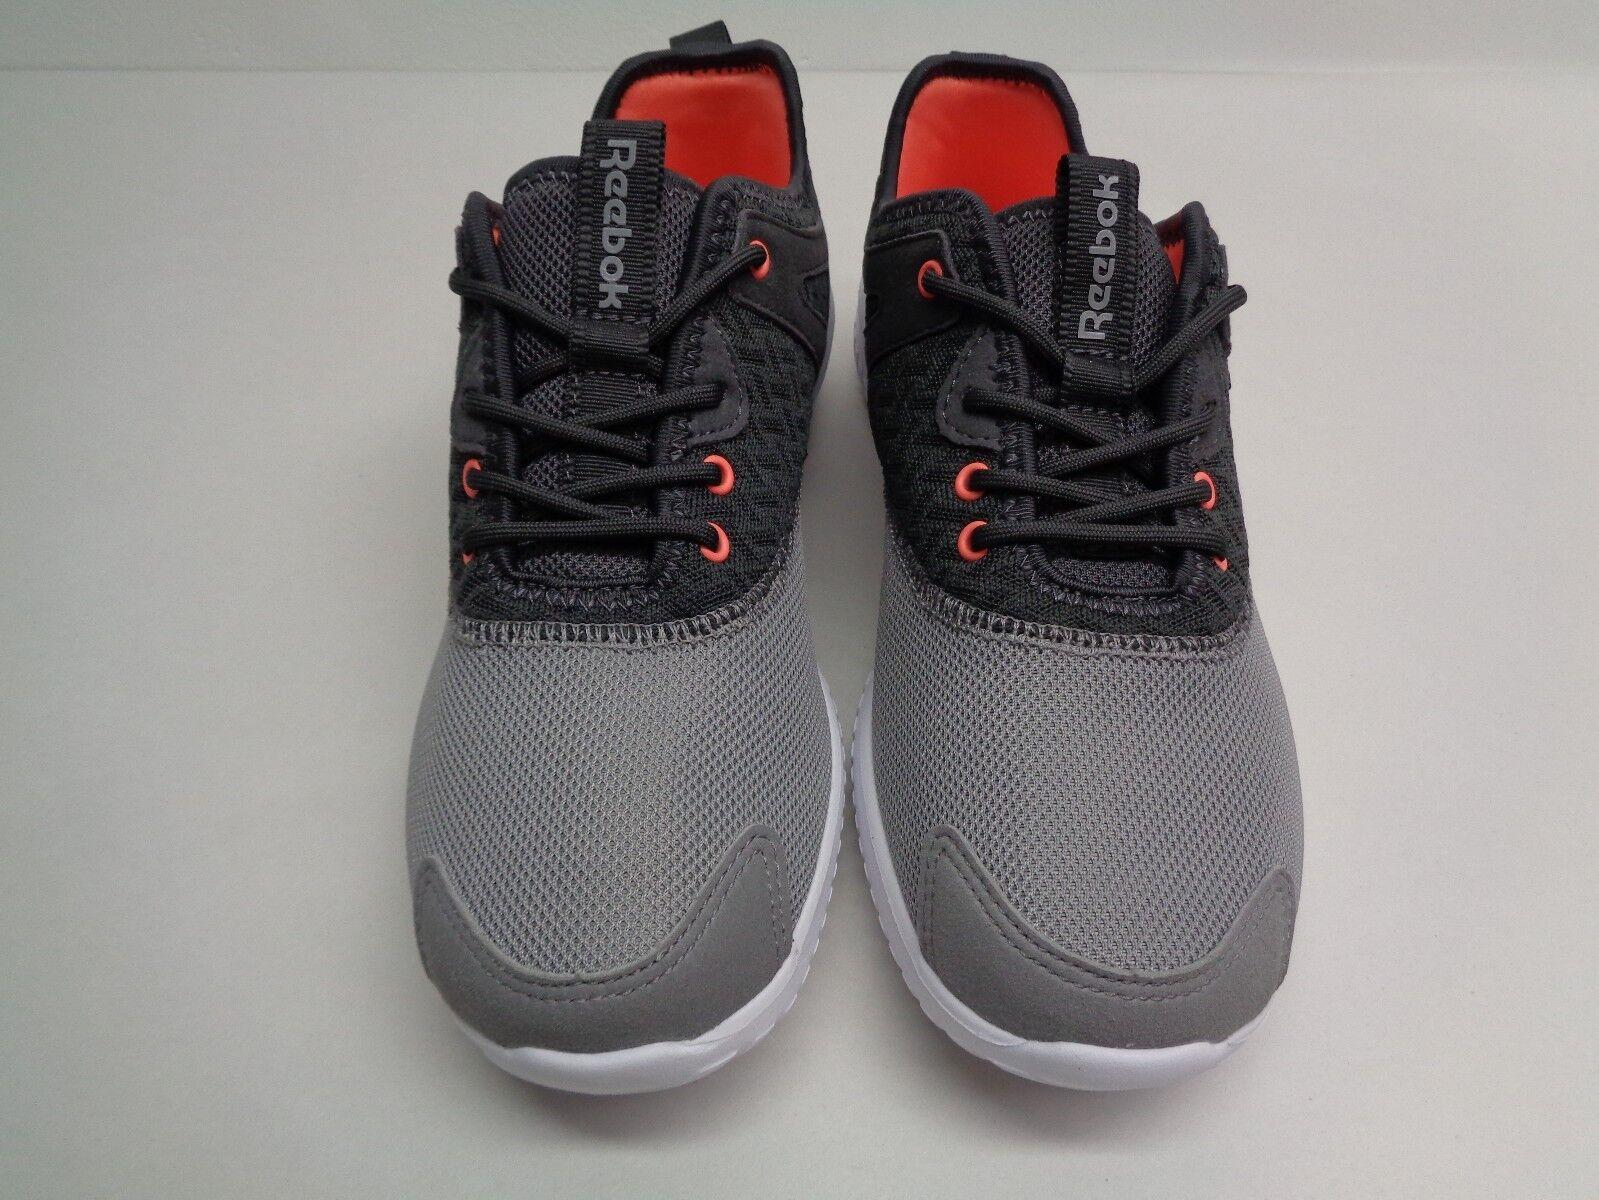 Reebok Größe Größe Reebok 10 M STYLESCAPE 2.0 ARCH Gray Training Sneakers New Damenschuhe Schuhes e976ef